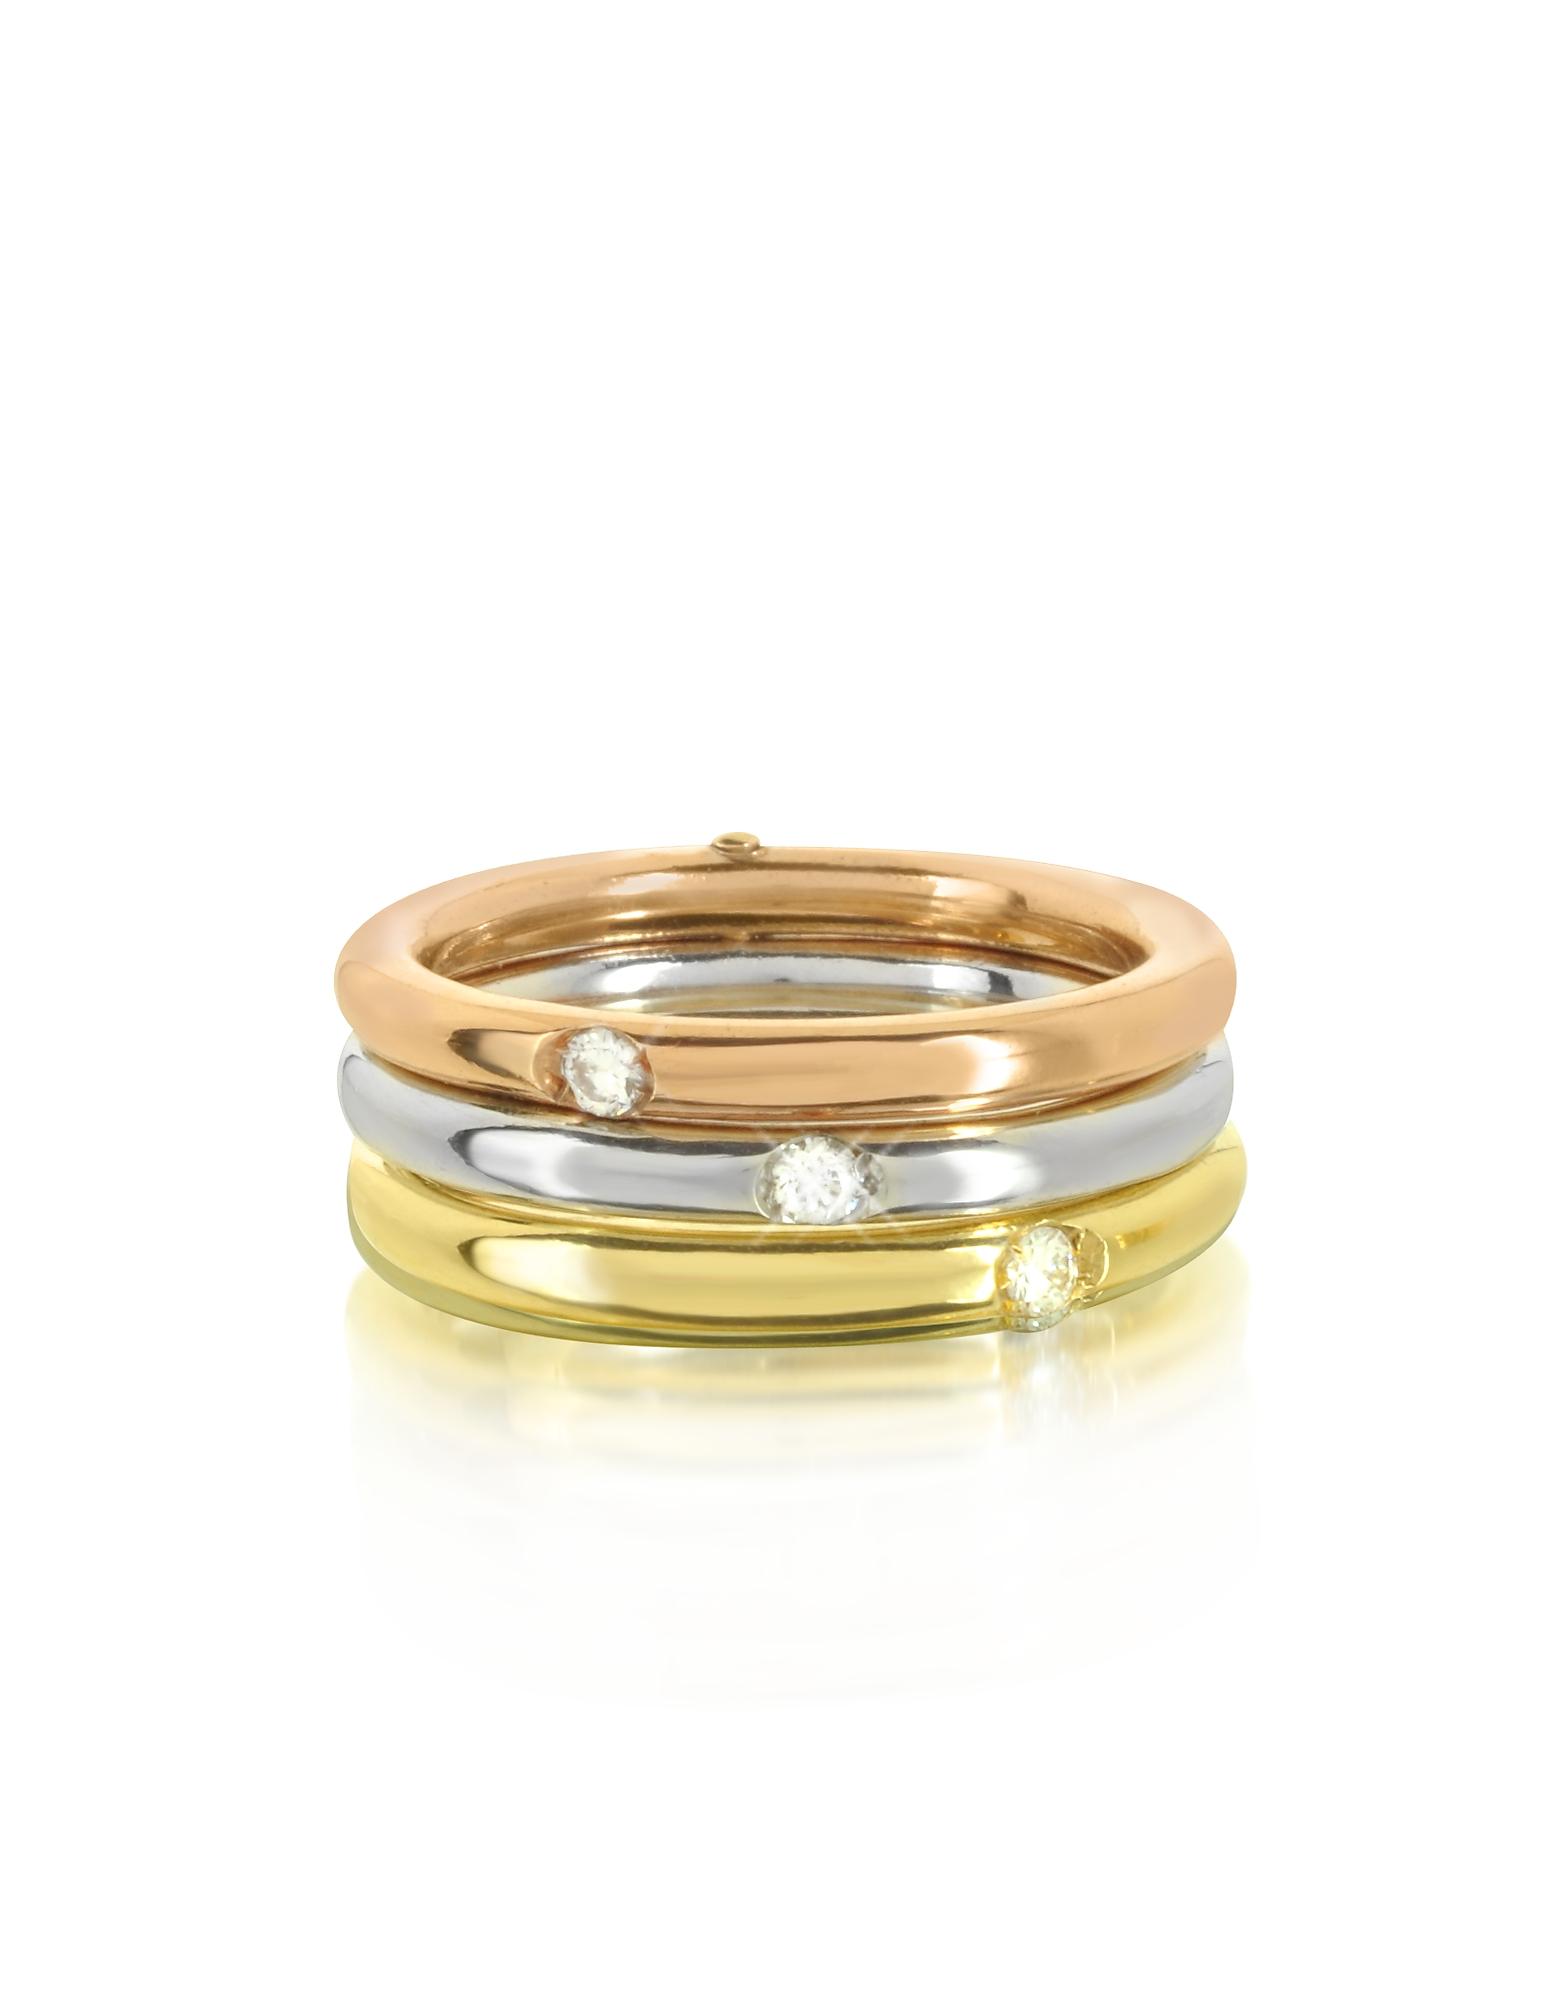 Bernard Delettrez Rings, 18K White, Yellow and Pink Gold Triple Secret Ring w/Diamonds